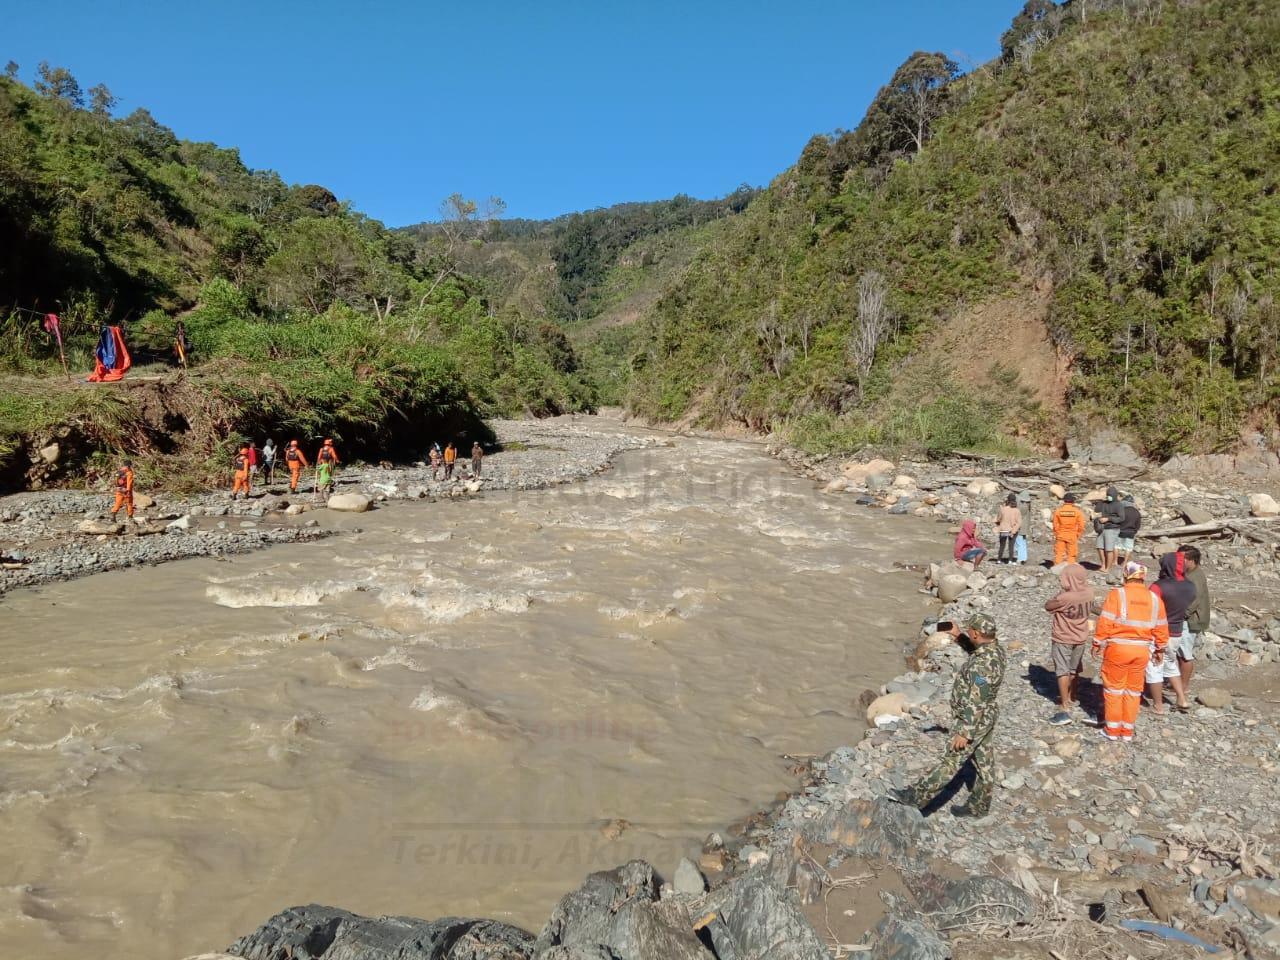 Basarnas Cari Warga Manokwari Terseret Arus di Sungai Didohu 15 IMG 20210315 WA0021